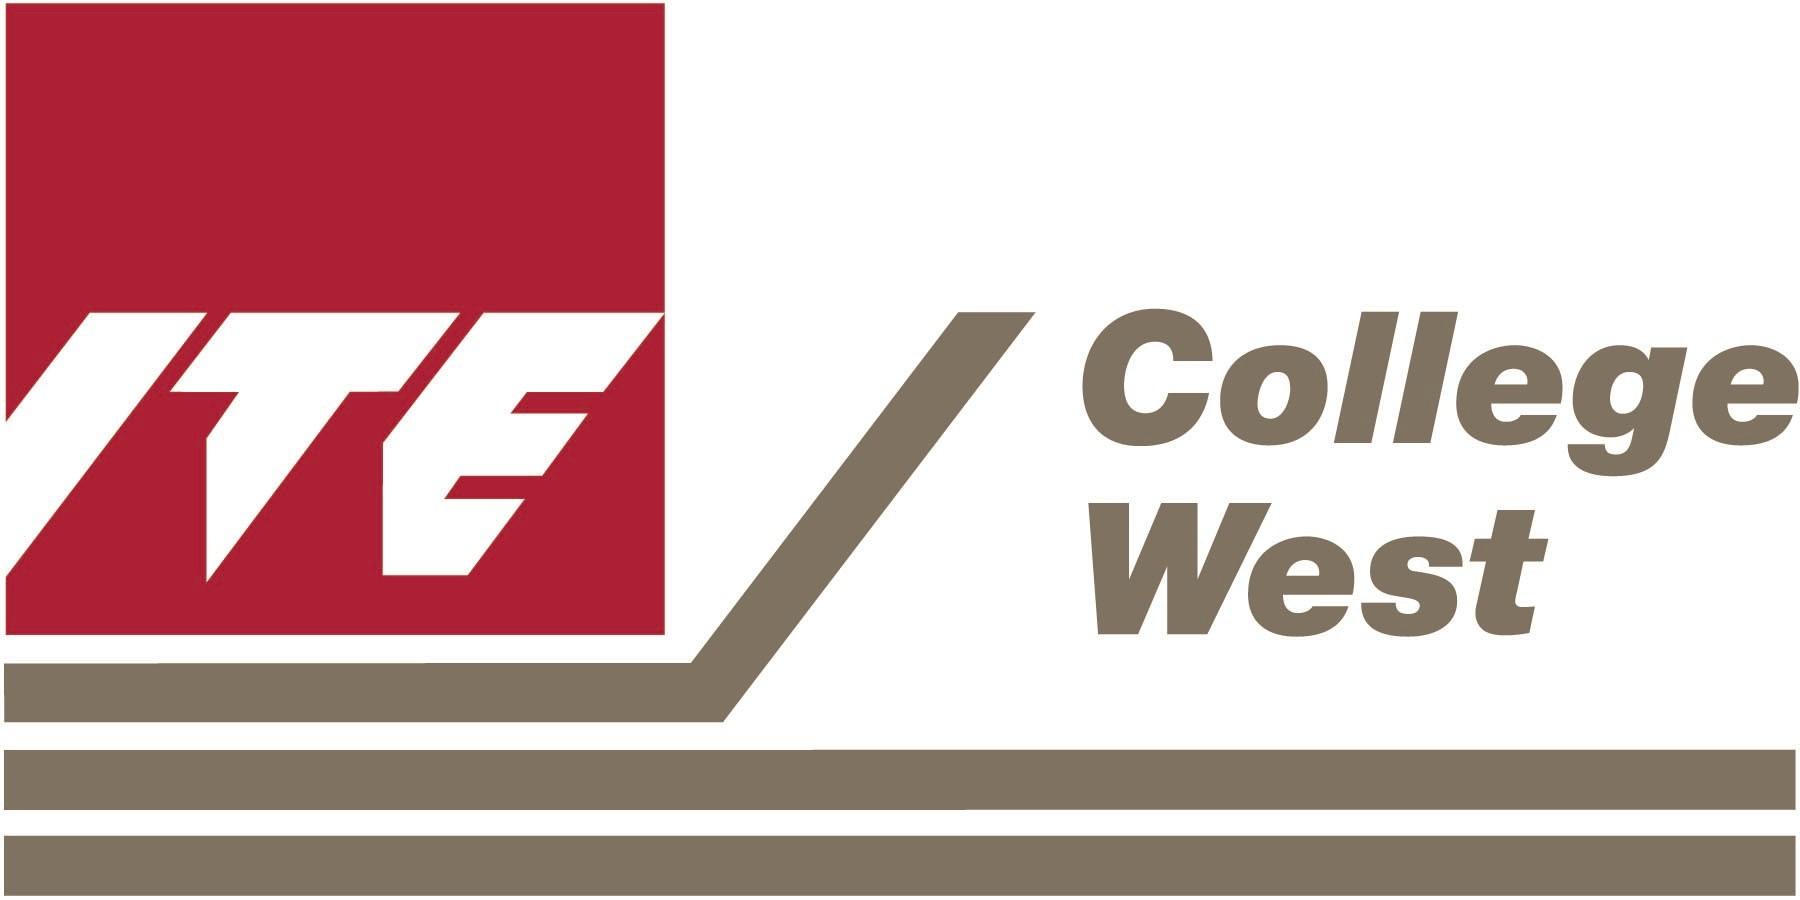 http://activelifestylegroup.com/sg/EDM//14/1700_IT_COLLEGE_West_logo.jpg